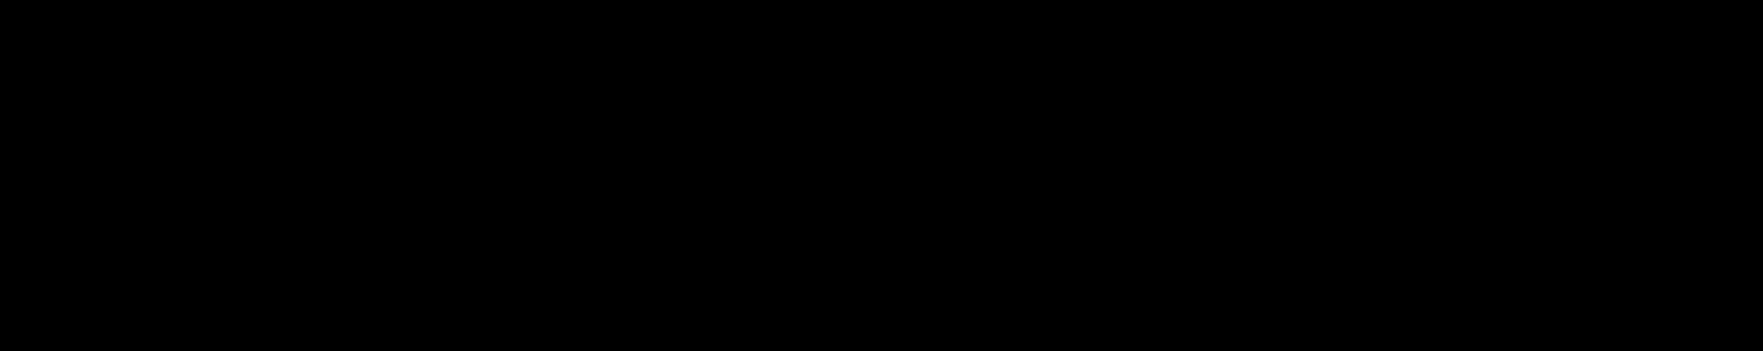 pnau_logo_round.png